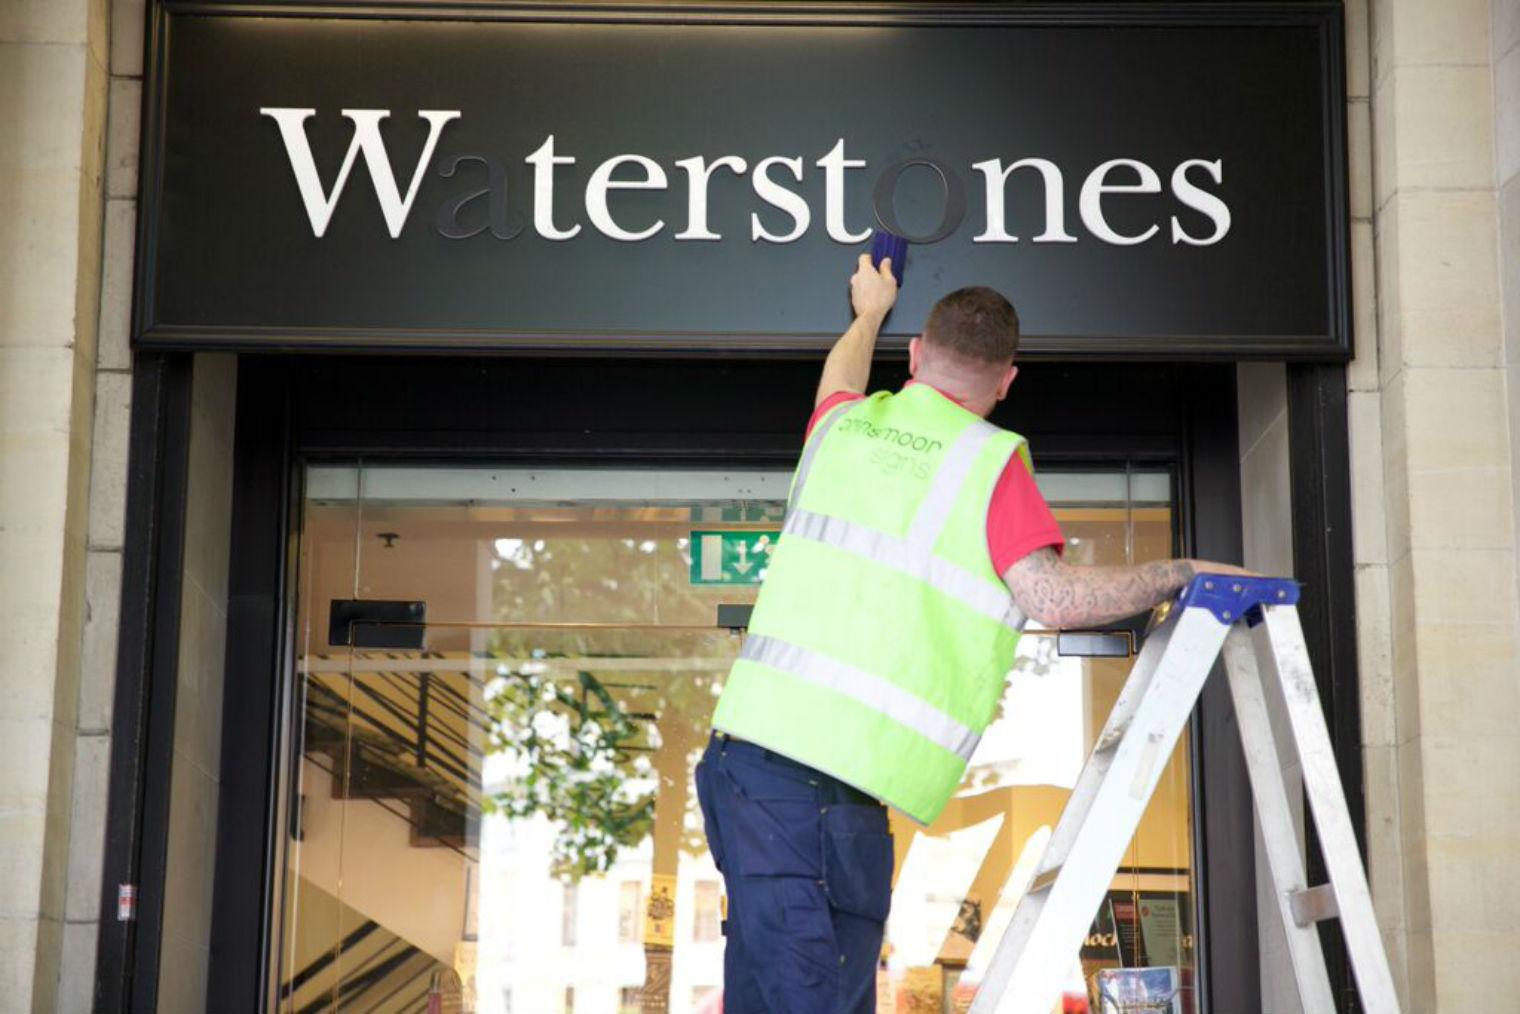 waterstones sign missing type NHS